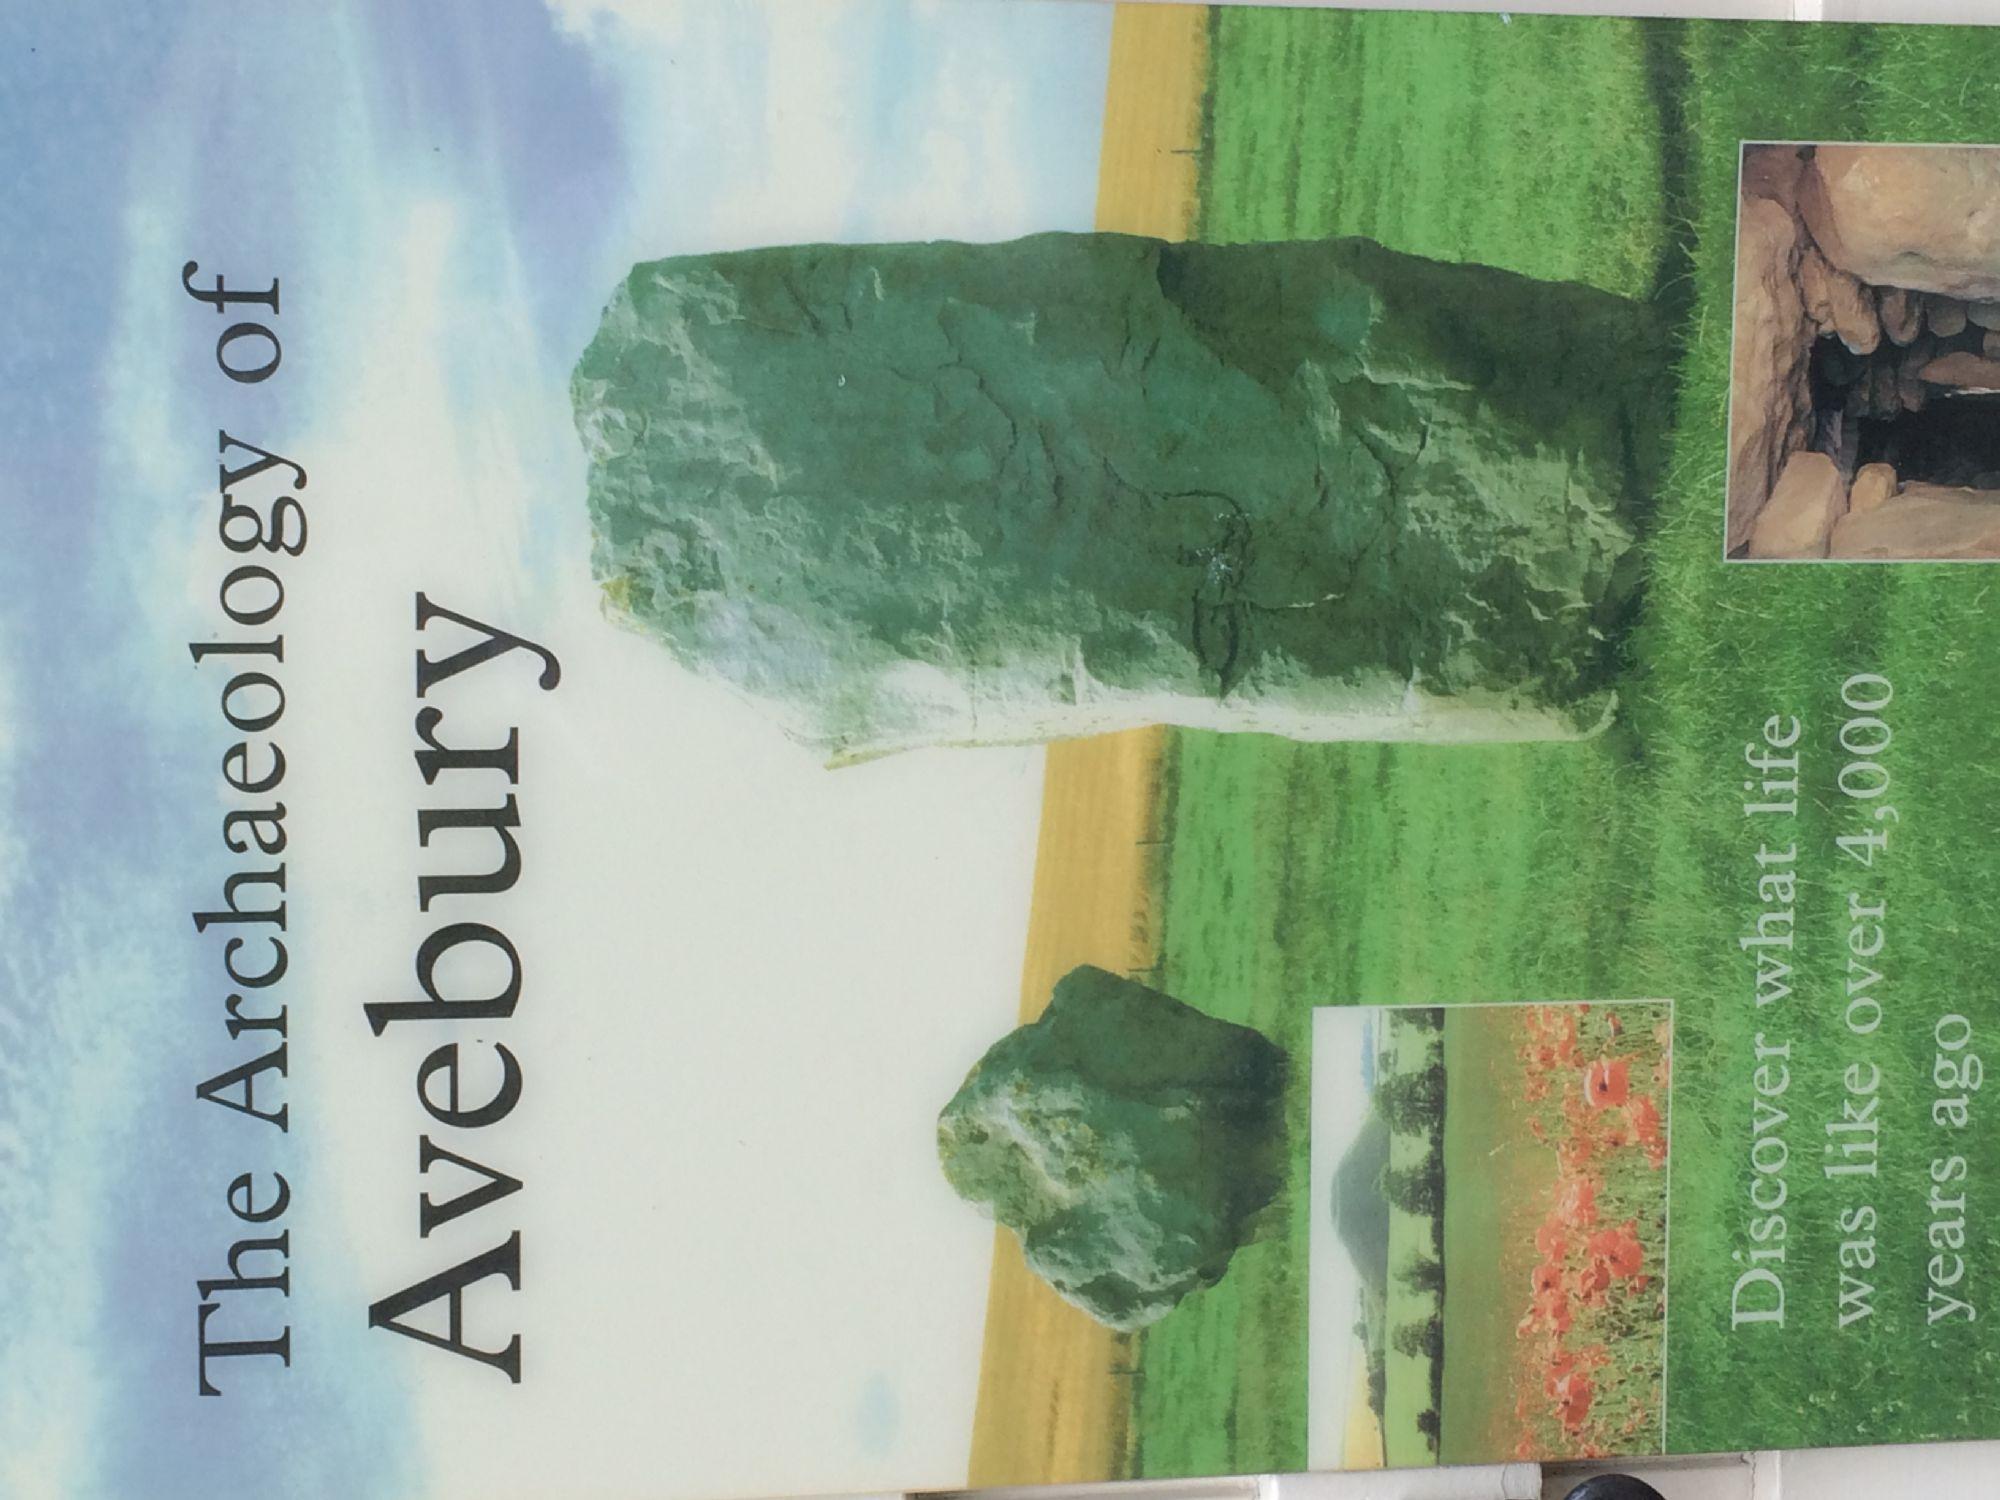 Avesbury mysterious rocks